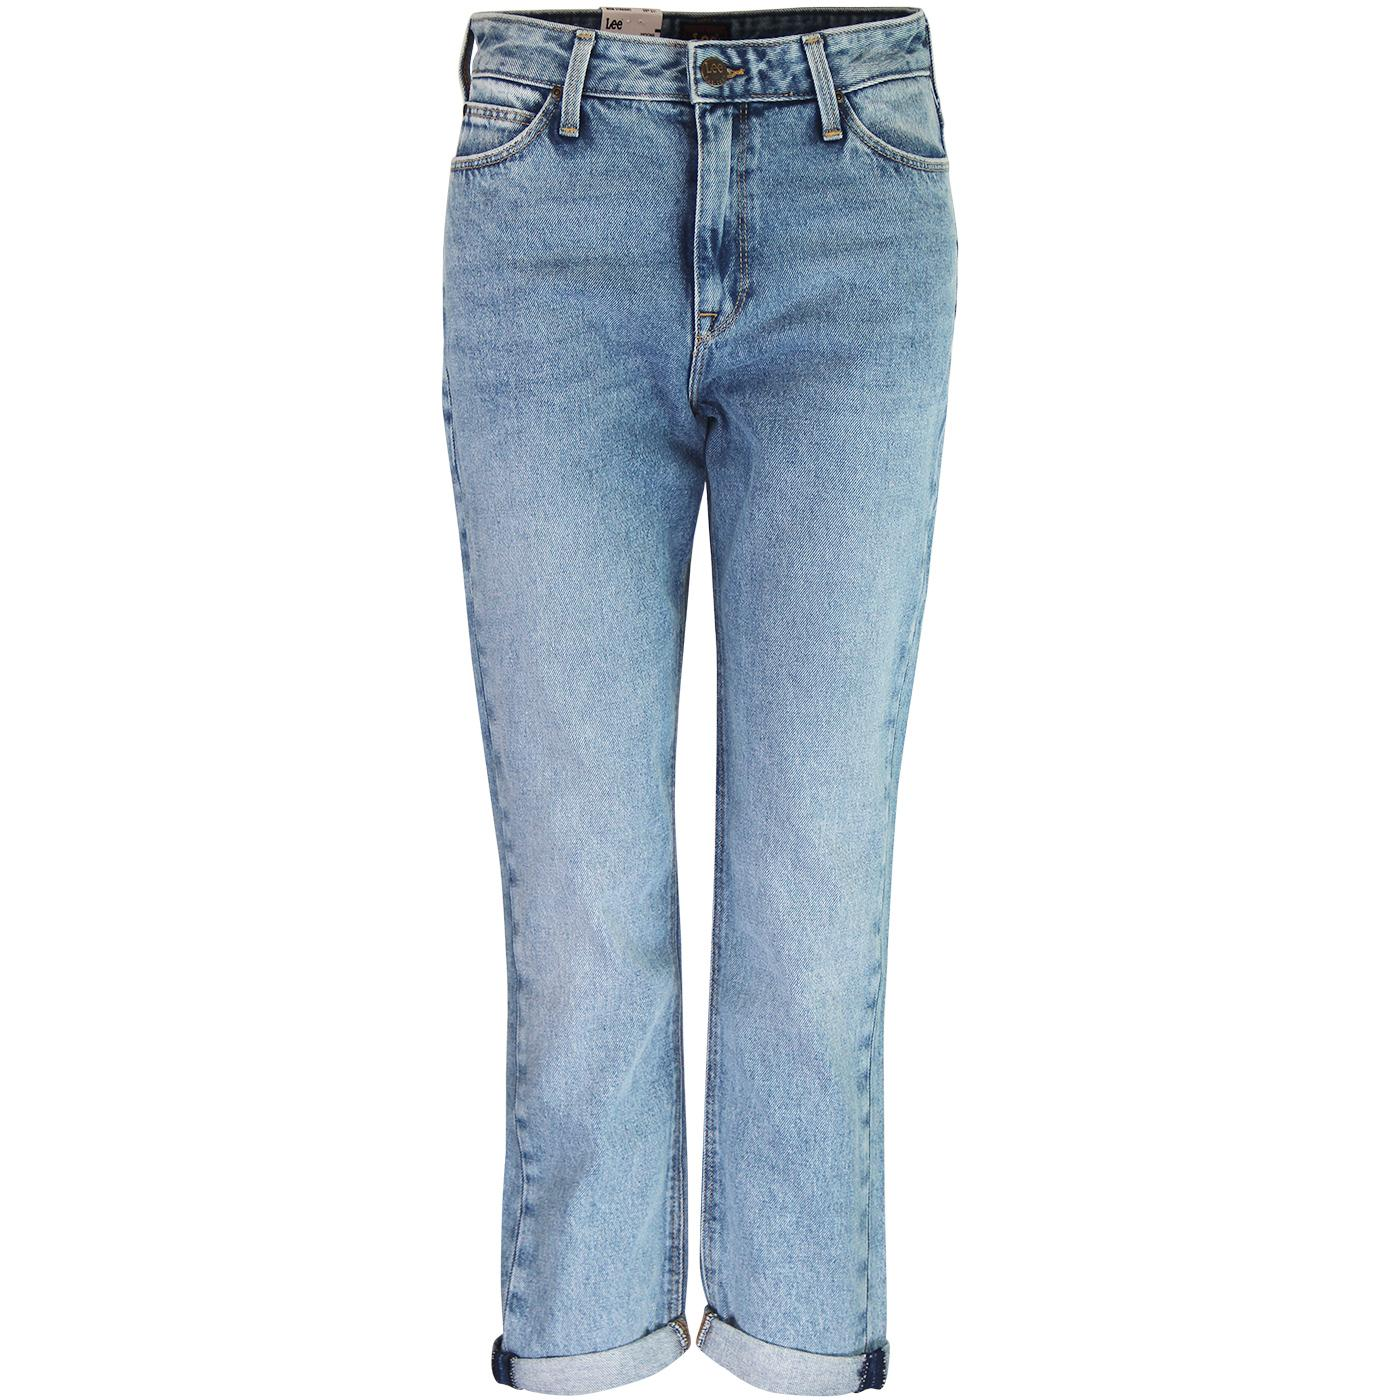 7f4860de LEE Mom Straight Curved High Waist Retro Jeans in Gaslight